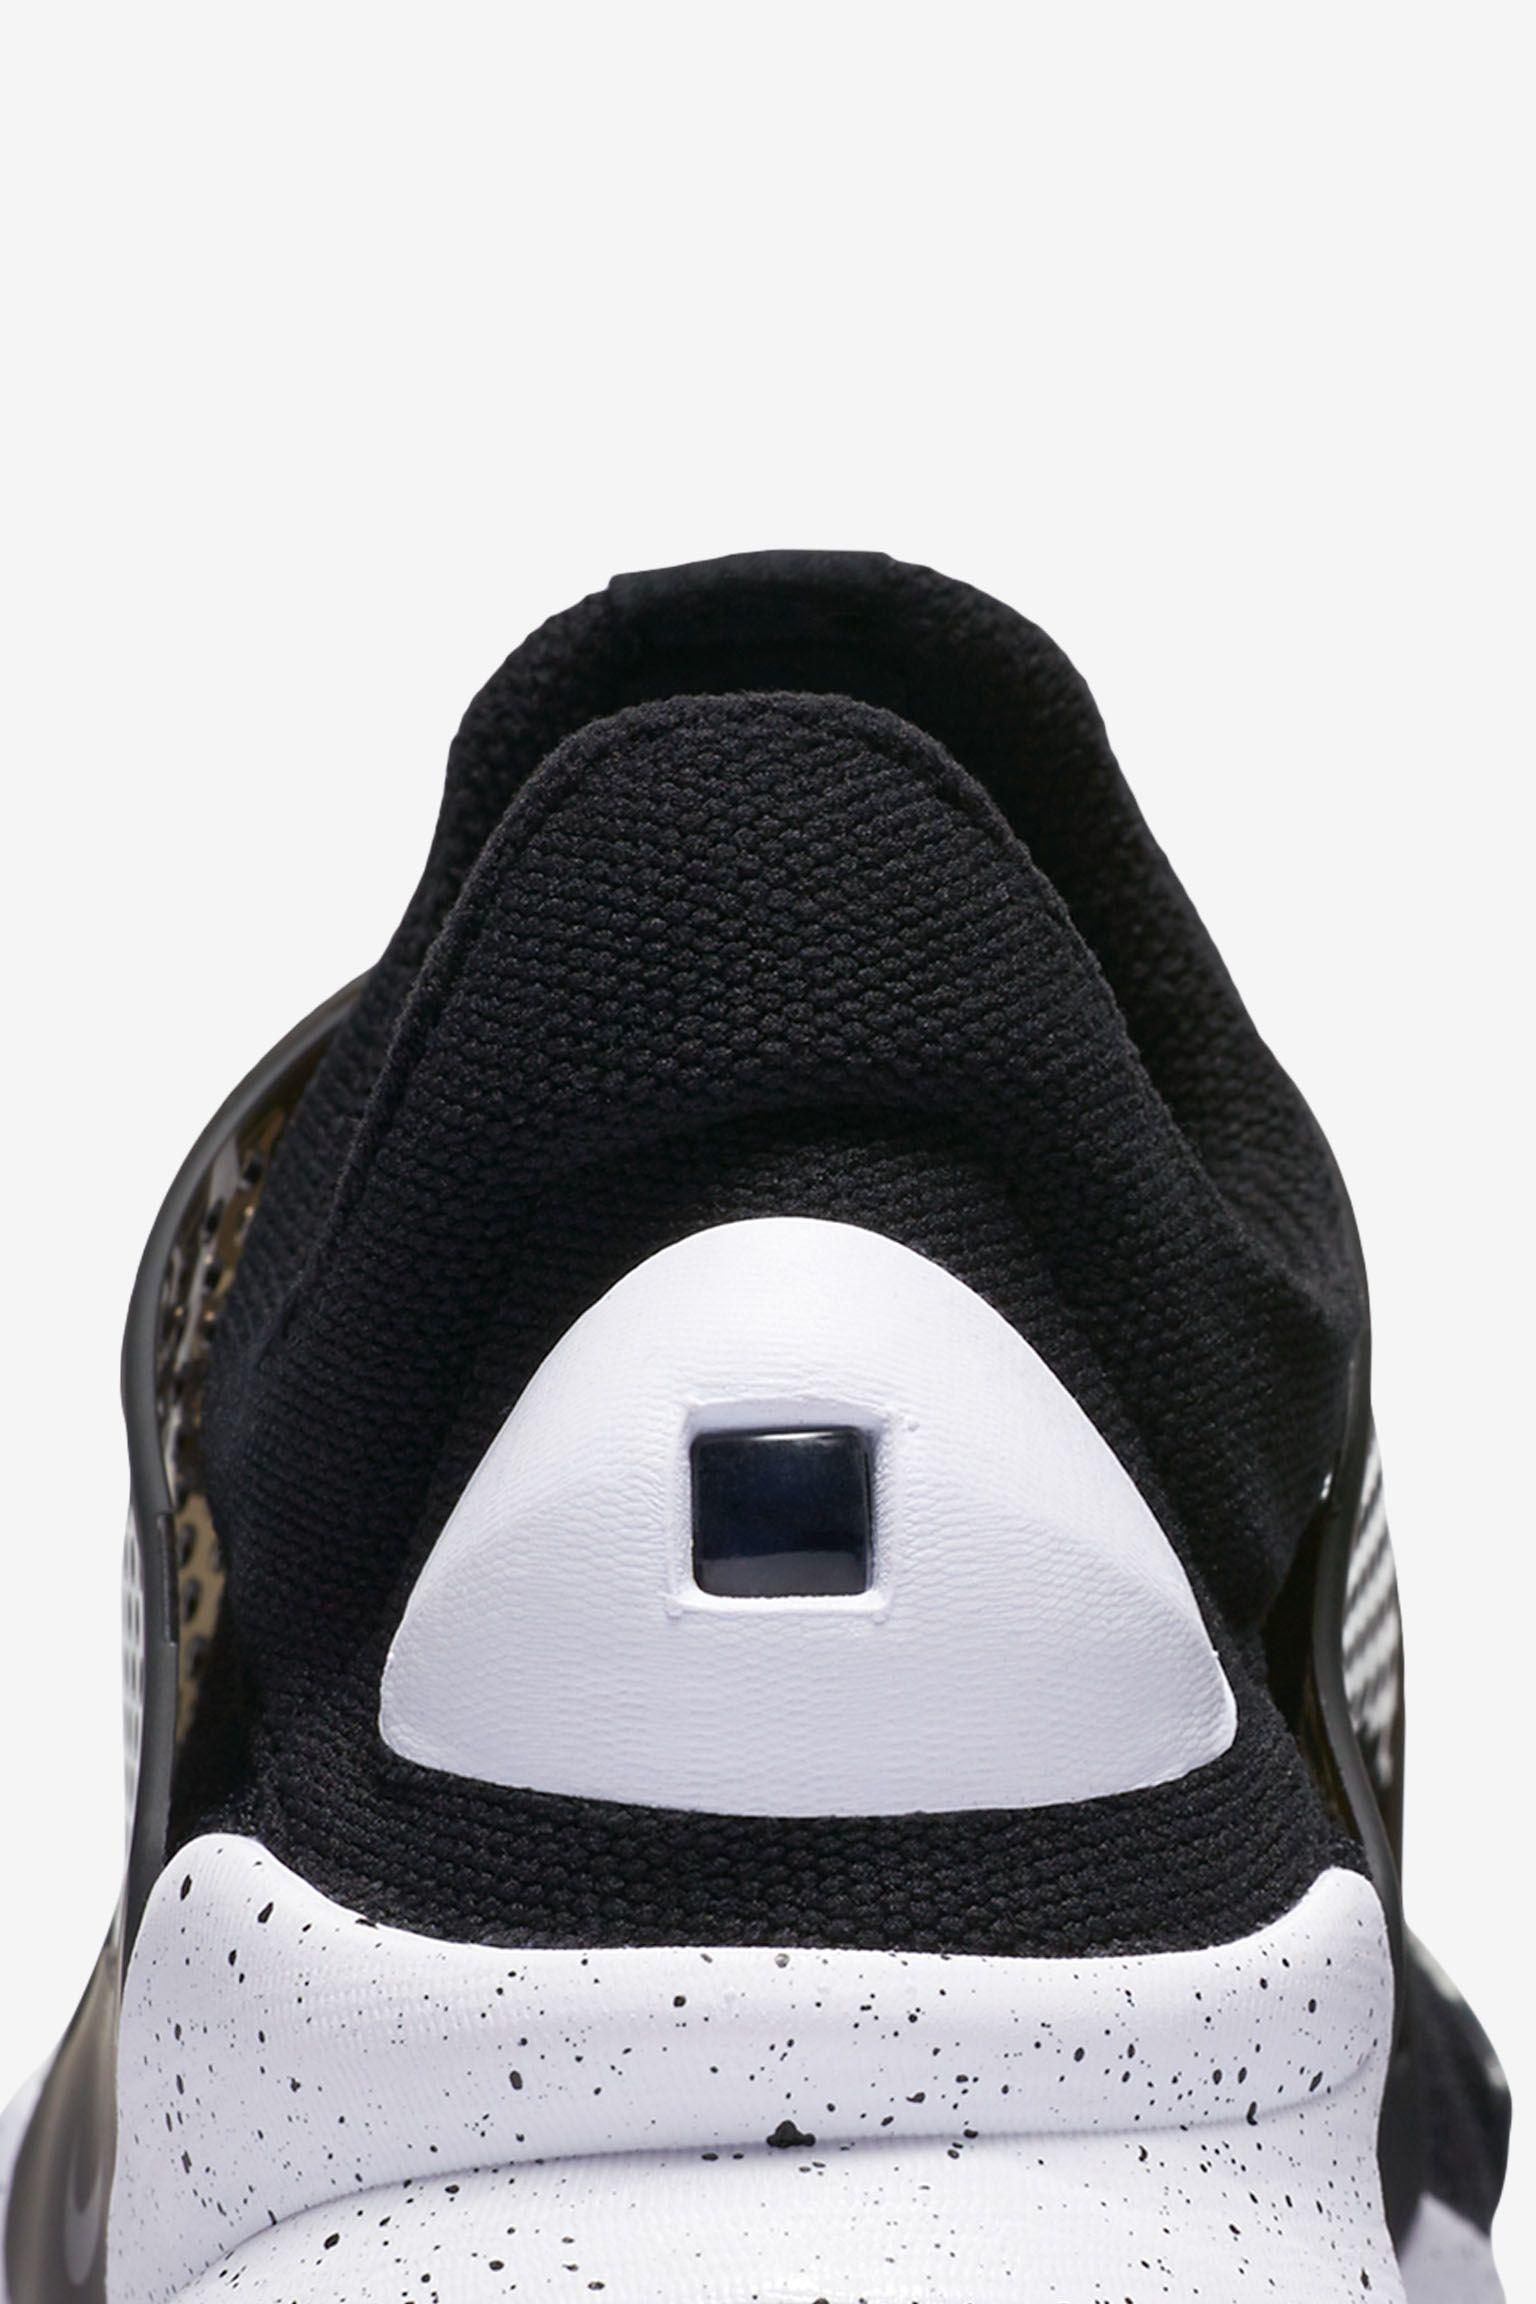 Nike Sock Dart 'On Target'